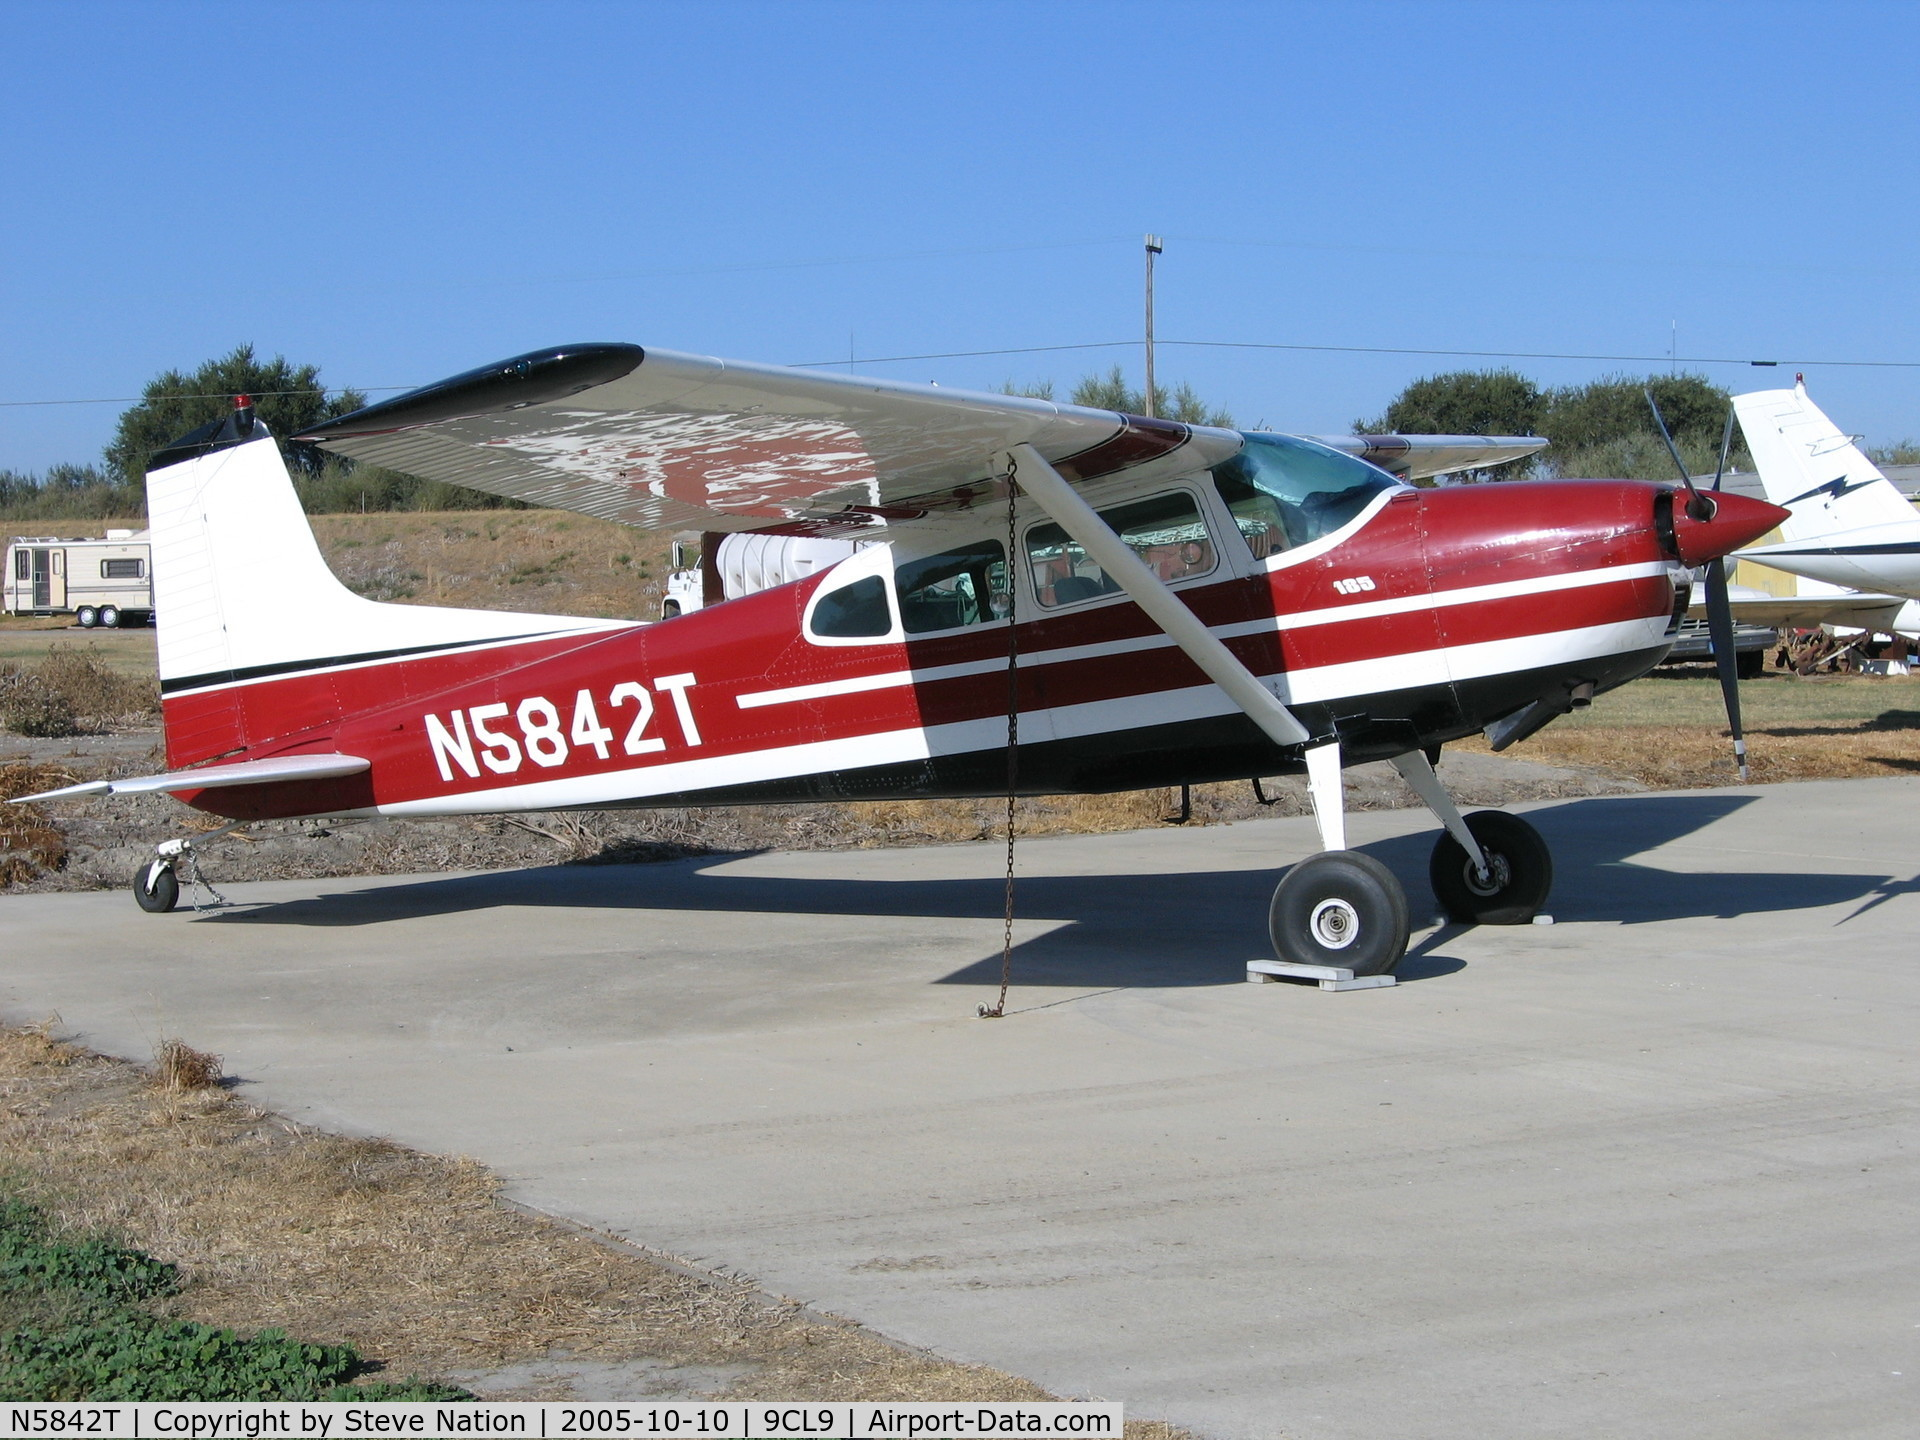 N5842T, 1964 Cessna 185C Skywagon C/N 185-0742, 1964 Cessna 185C at Spezia Airport, Walnut Grove, CA